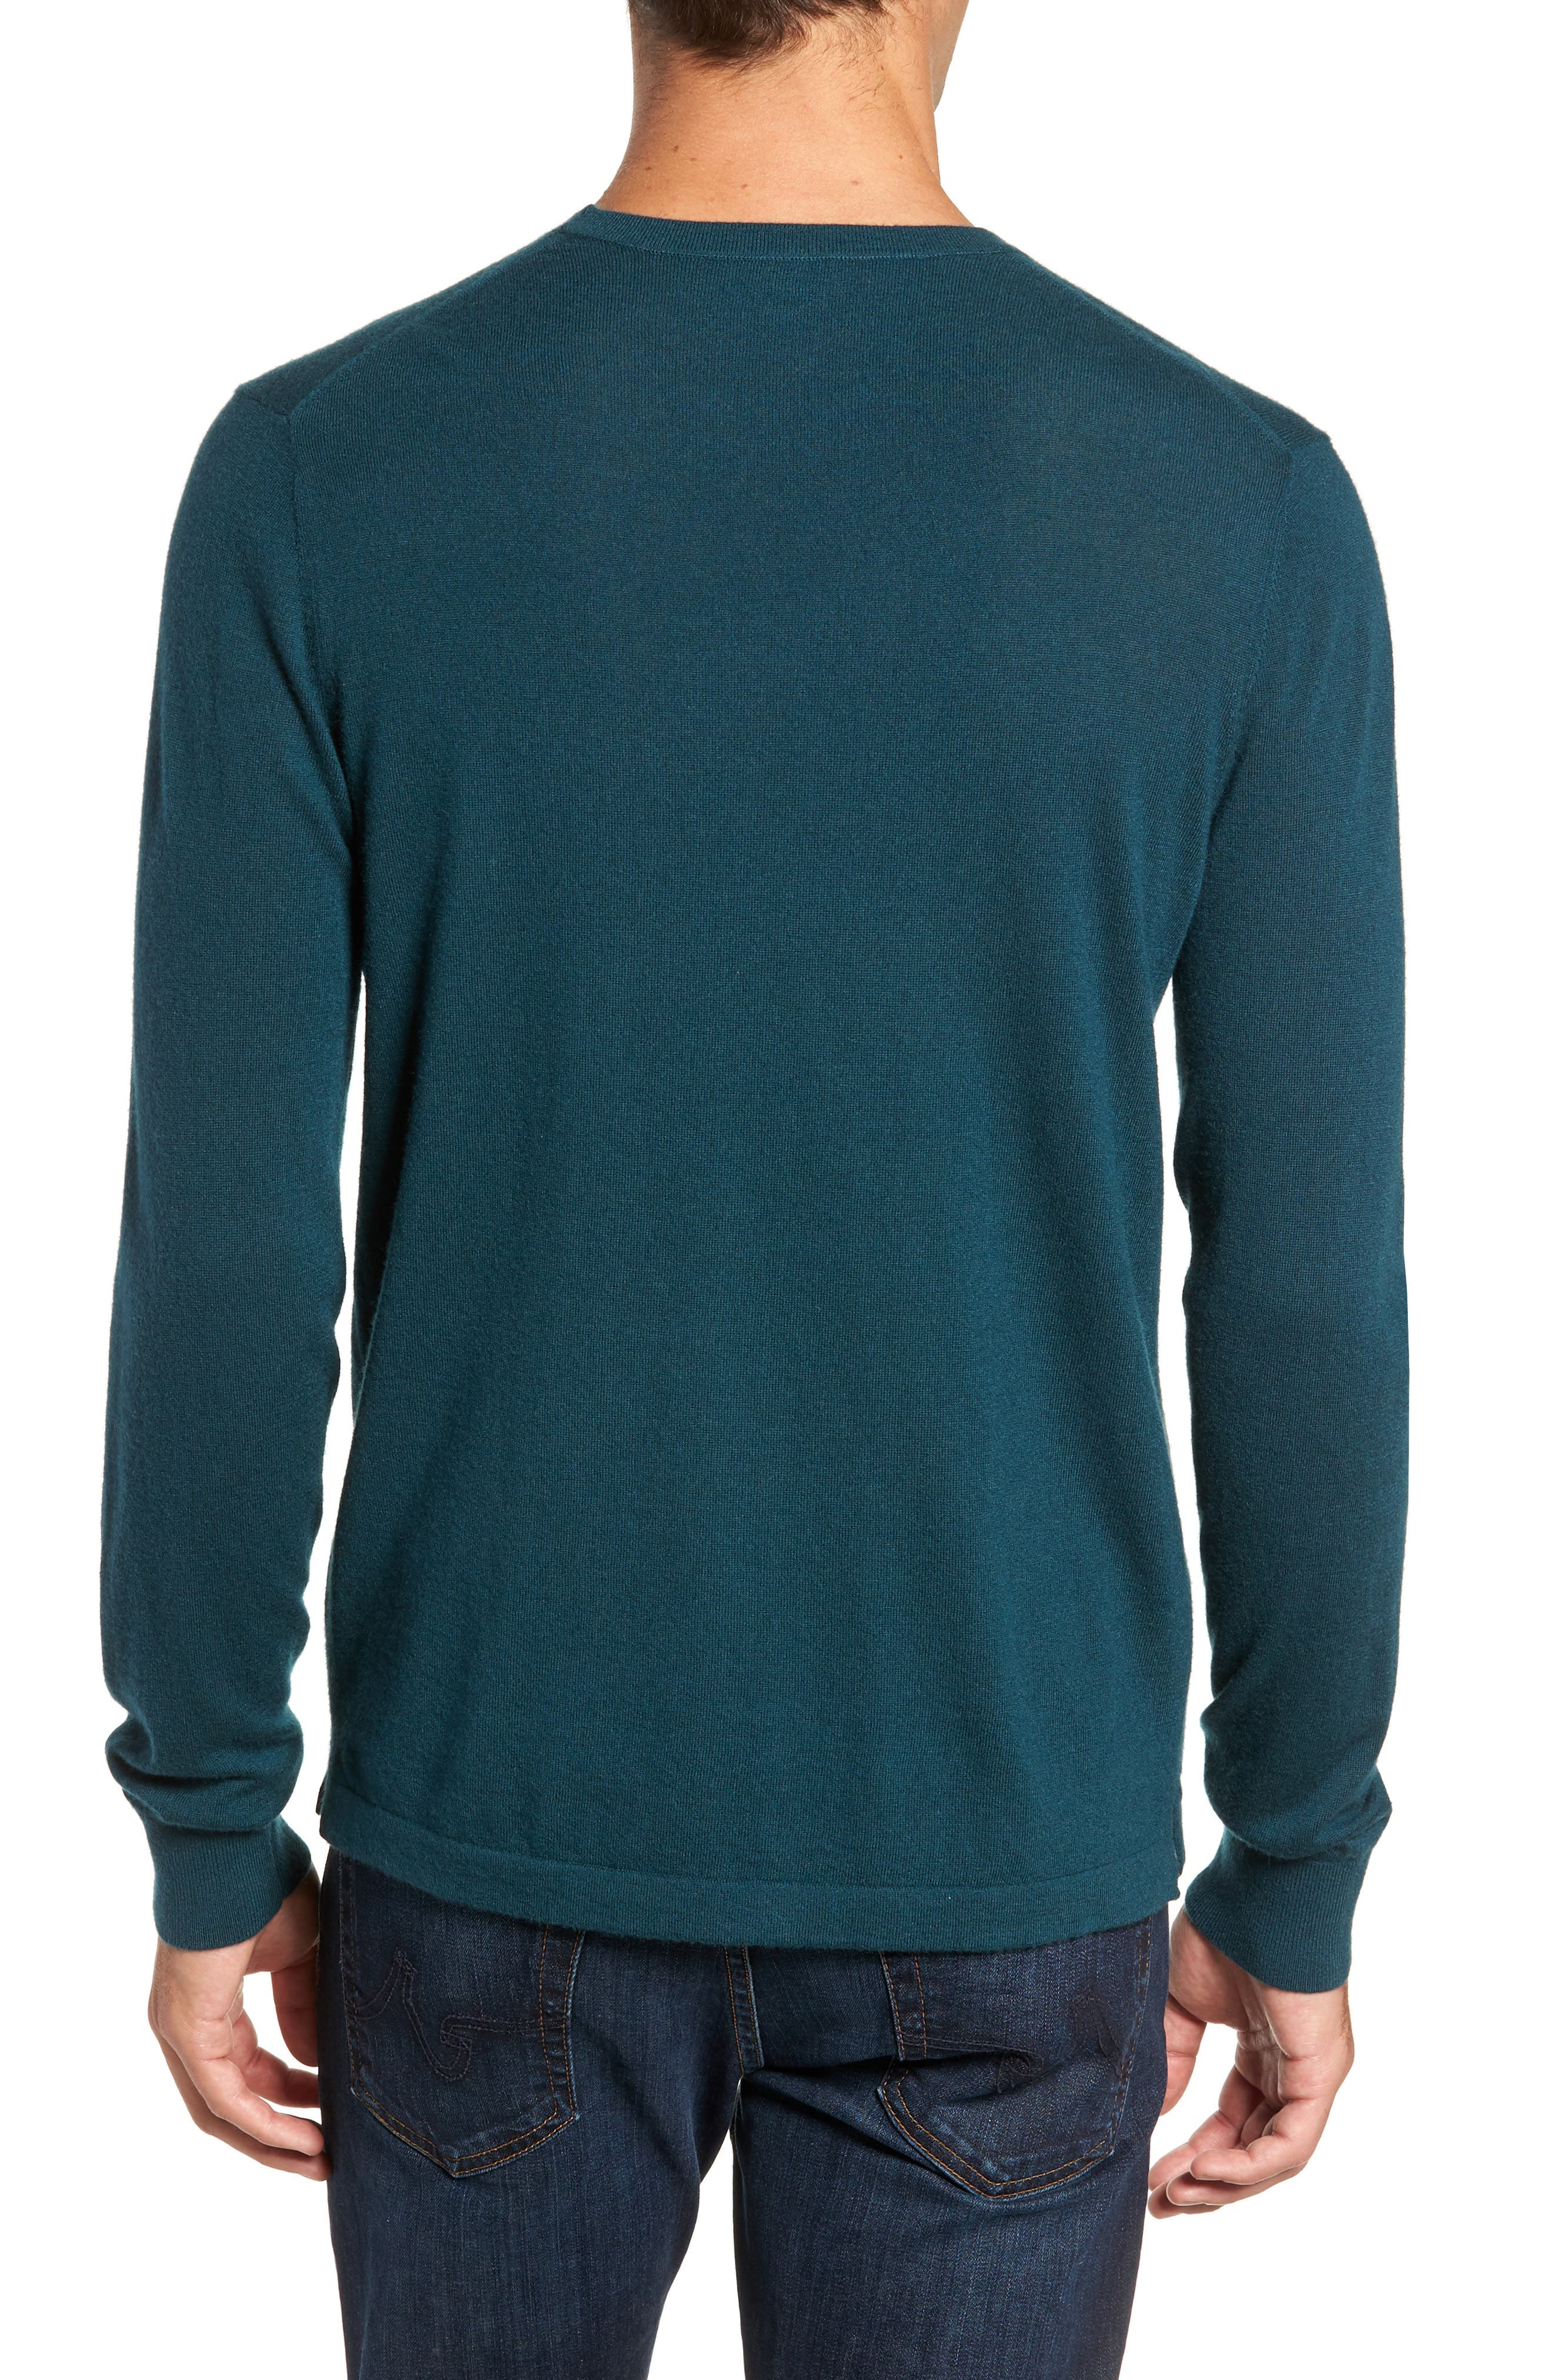 Cashmere Sweater,                             Alternate thumbnail 2, color,                             PETROL